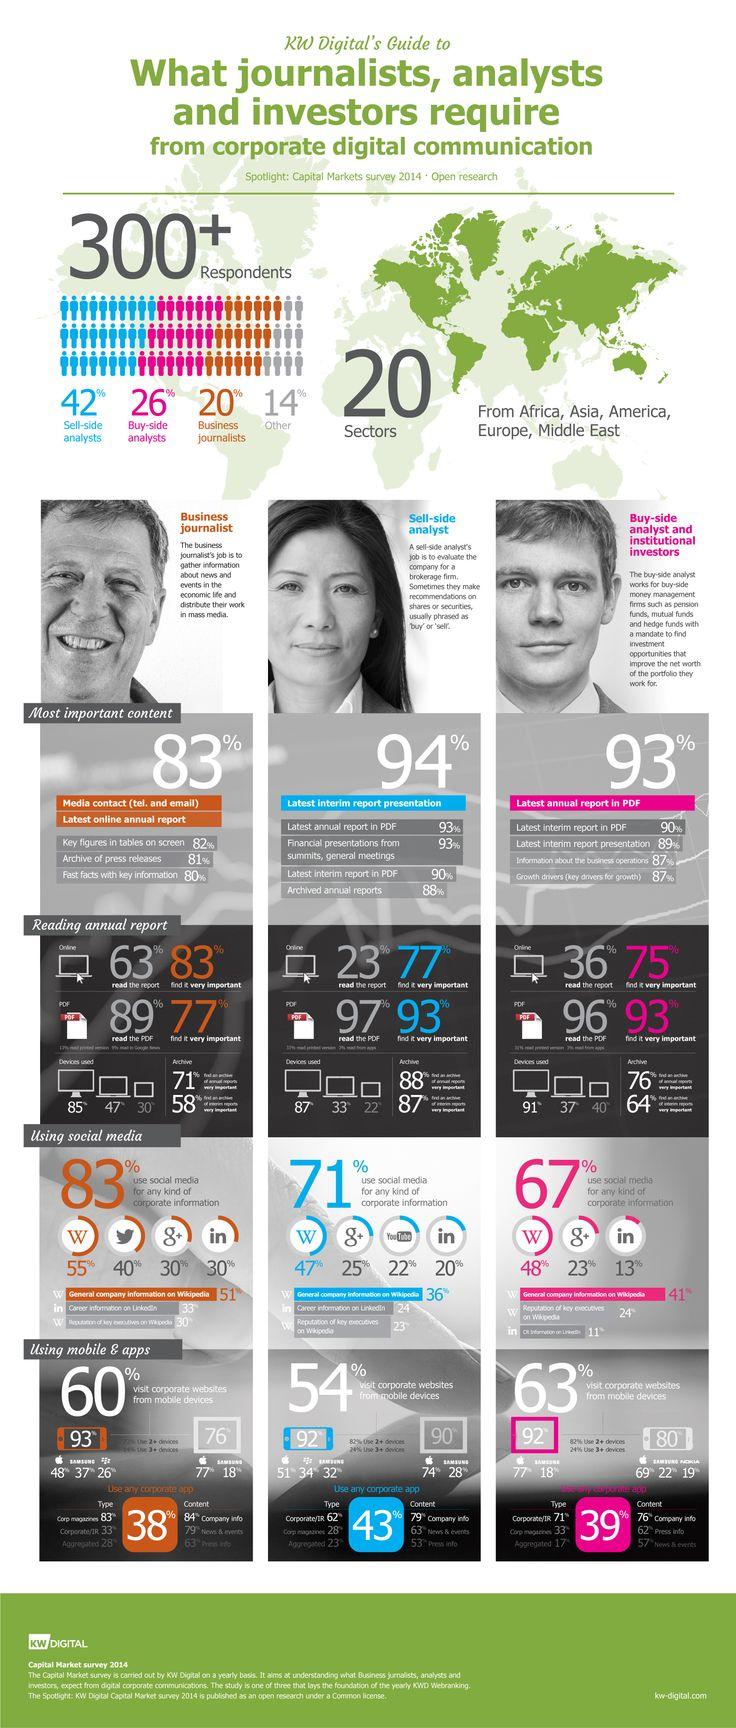 KW Digital Capital markets Survey 2014 - Profiles